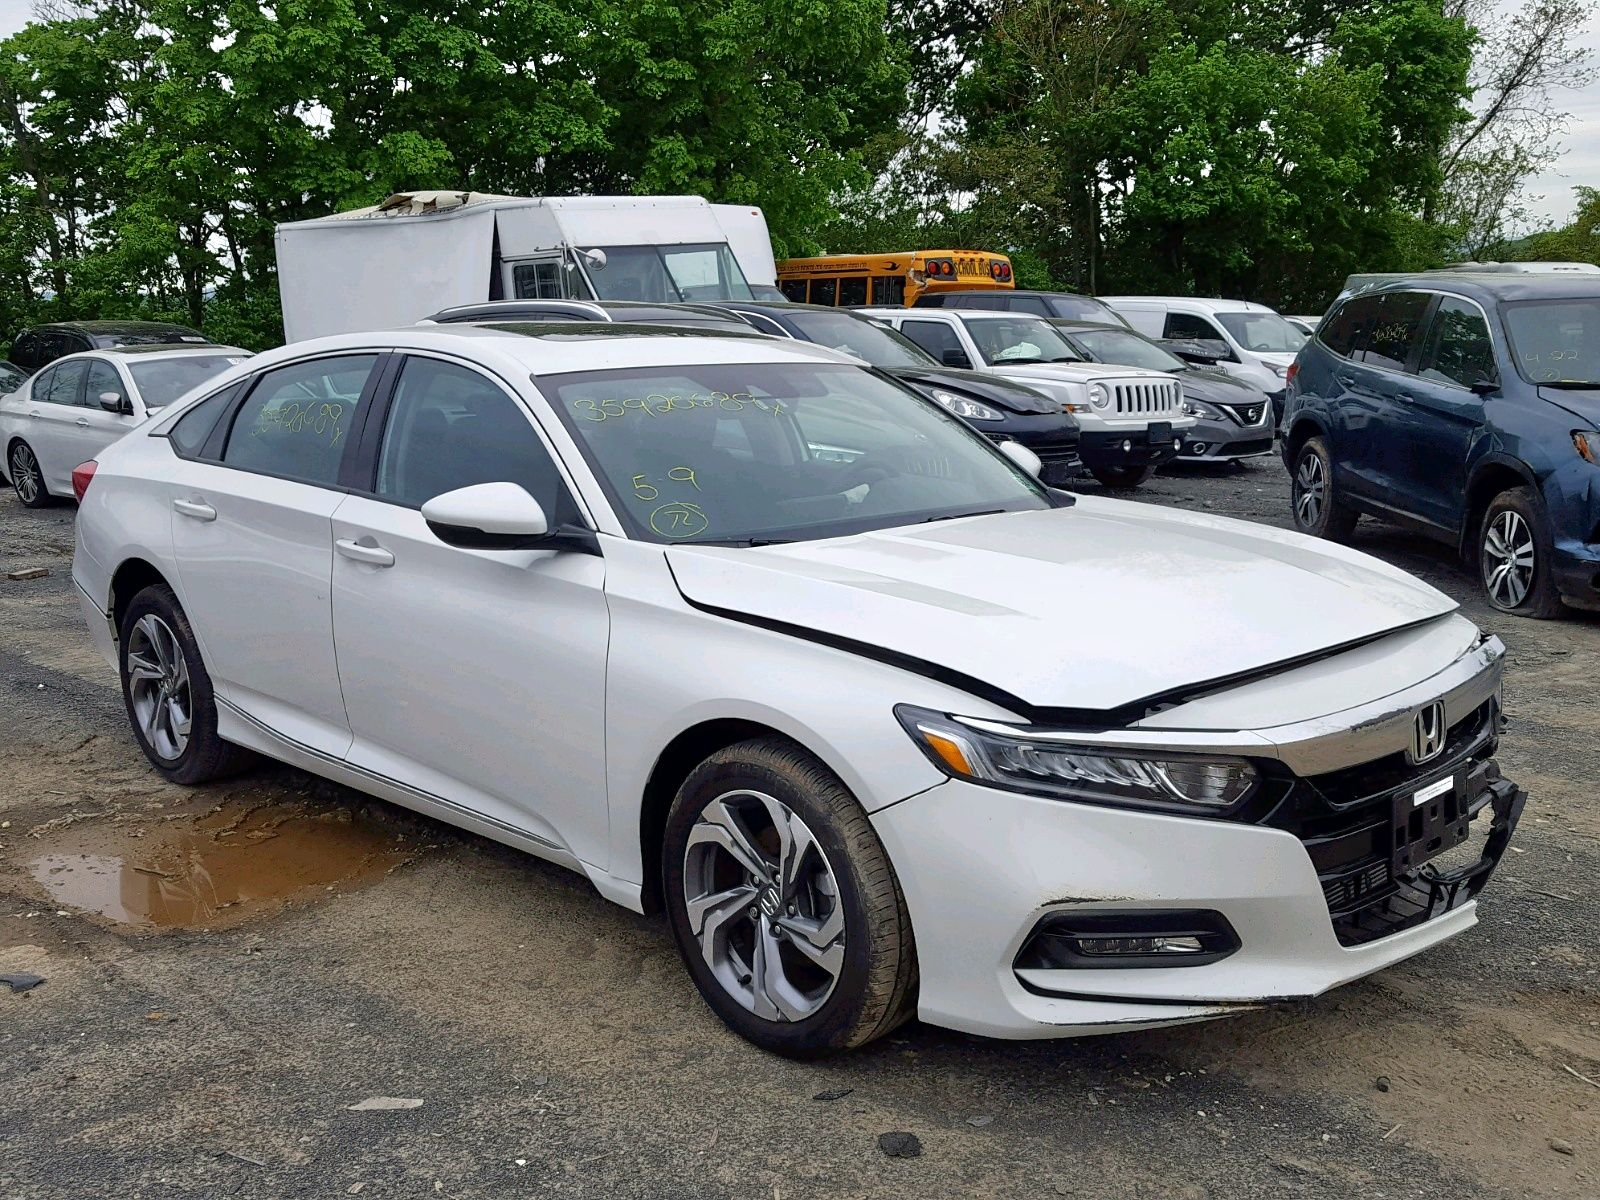 2018 Honda Accord Exl Salvage Auction Salvage cars